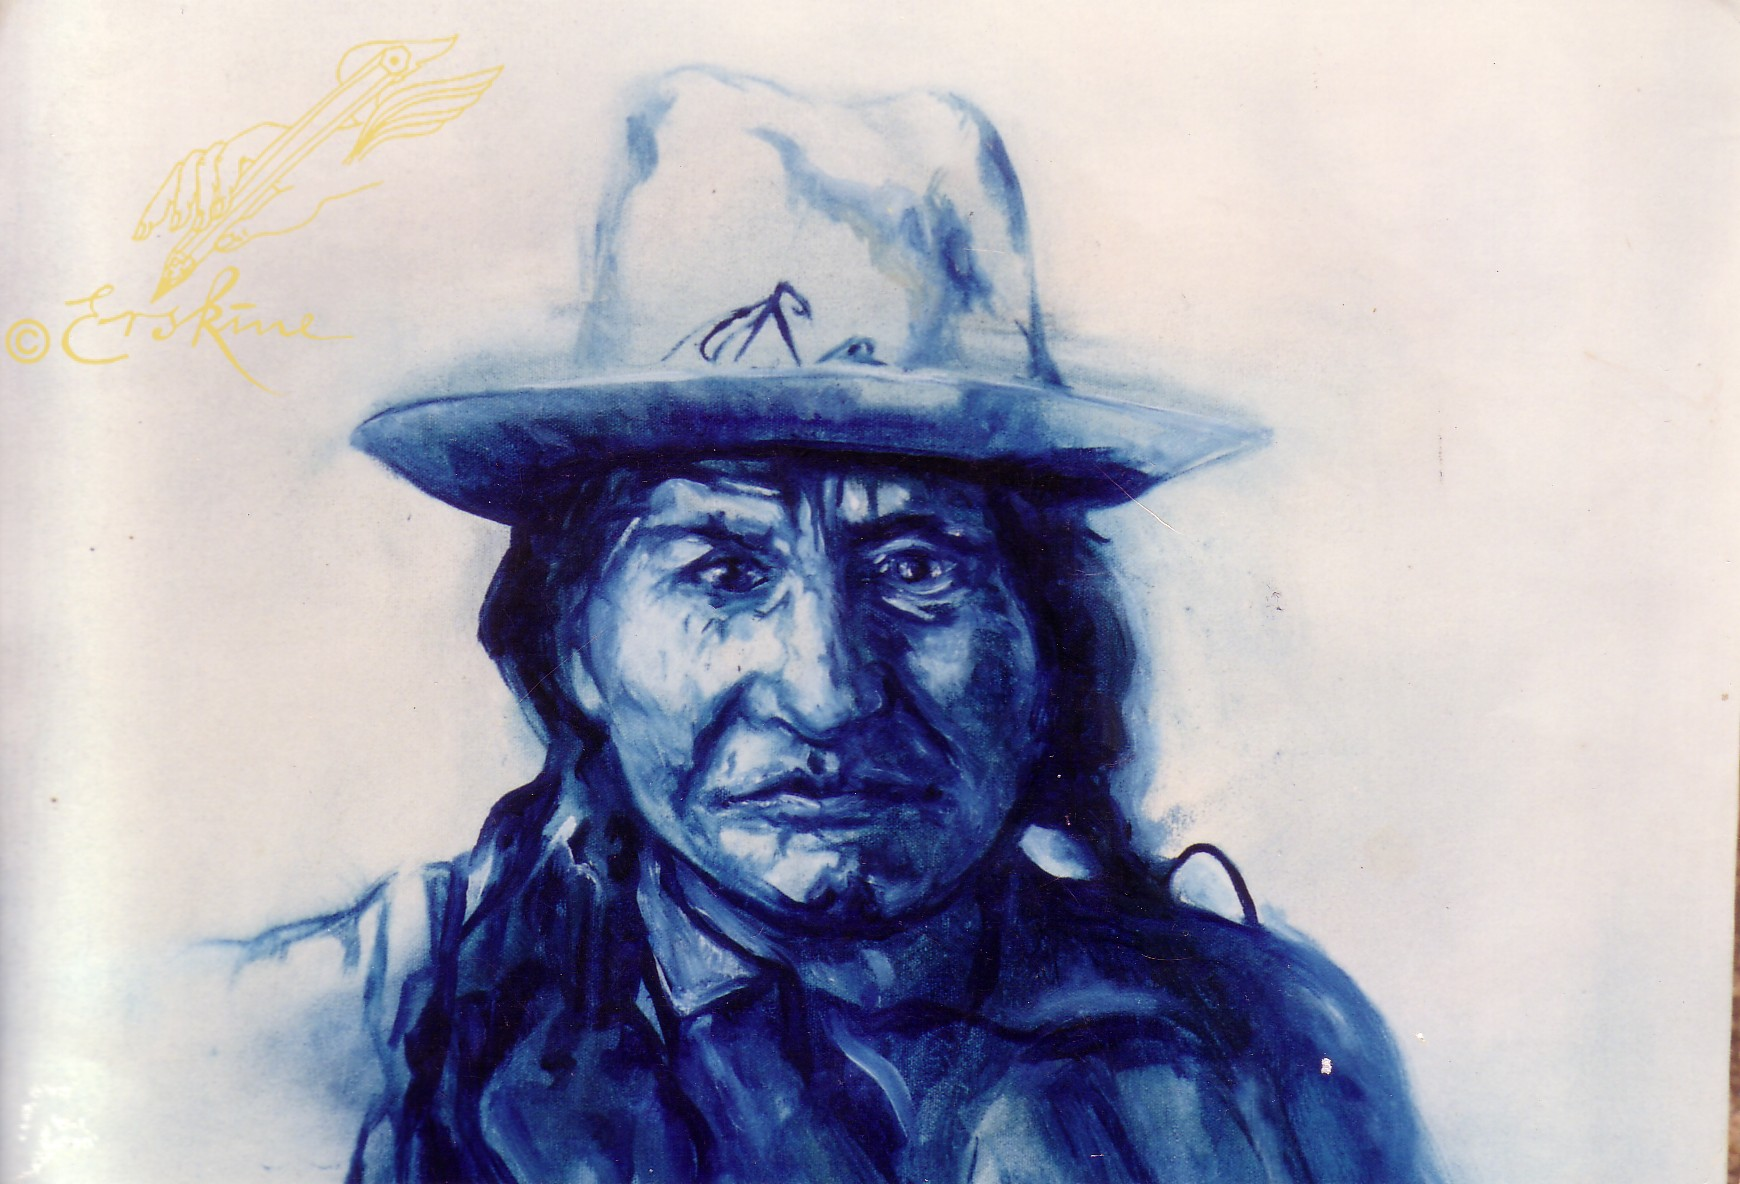 Geronimo - Chiricahua apache chief. oil on canvas, .8x.6m PC